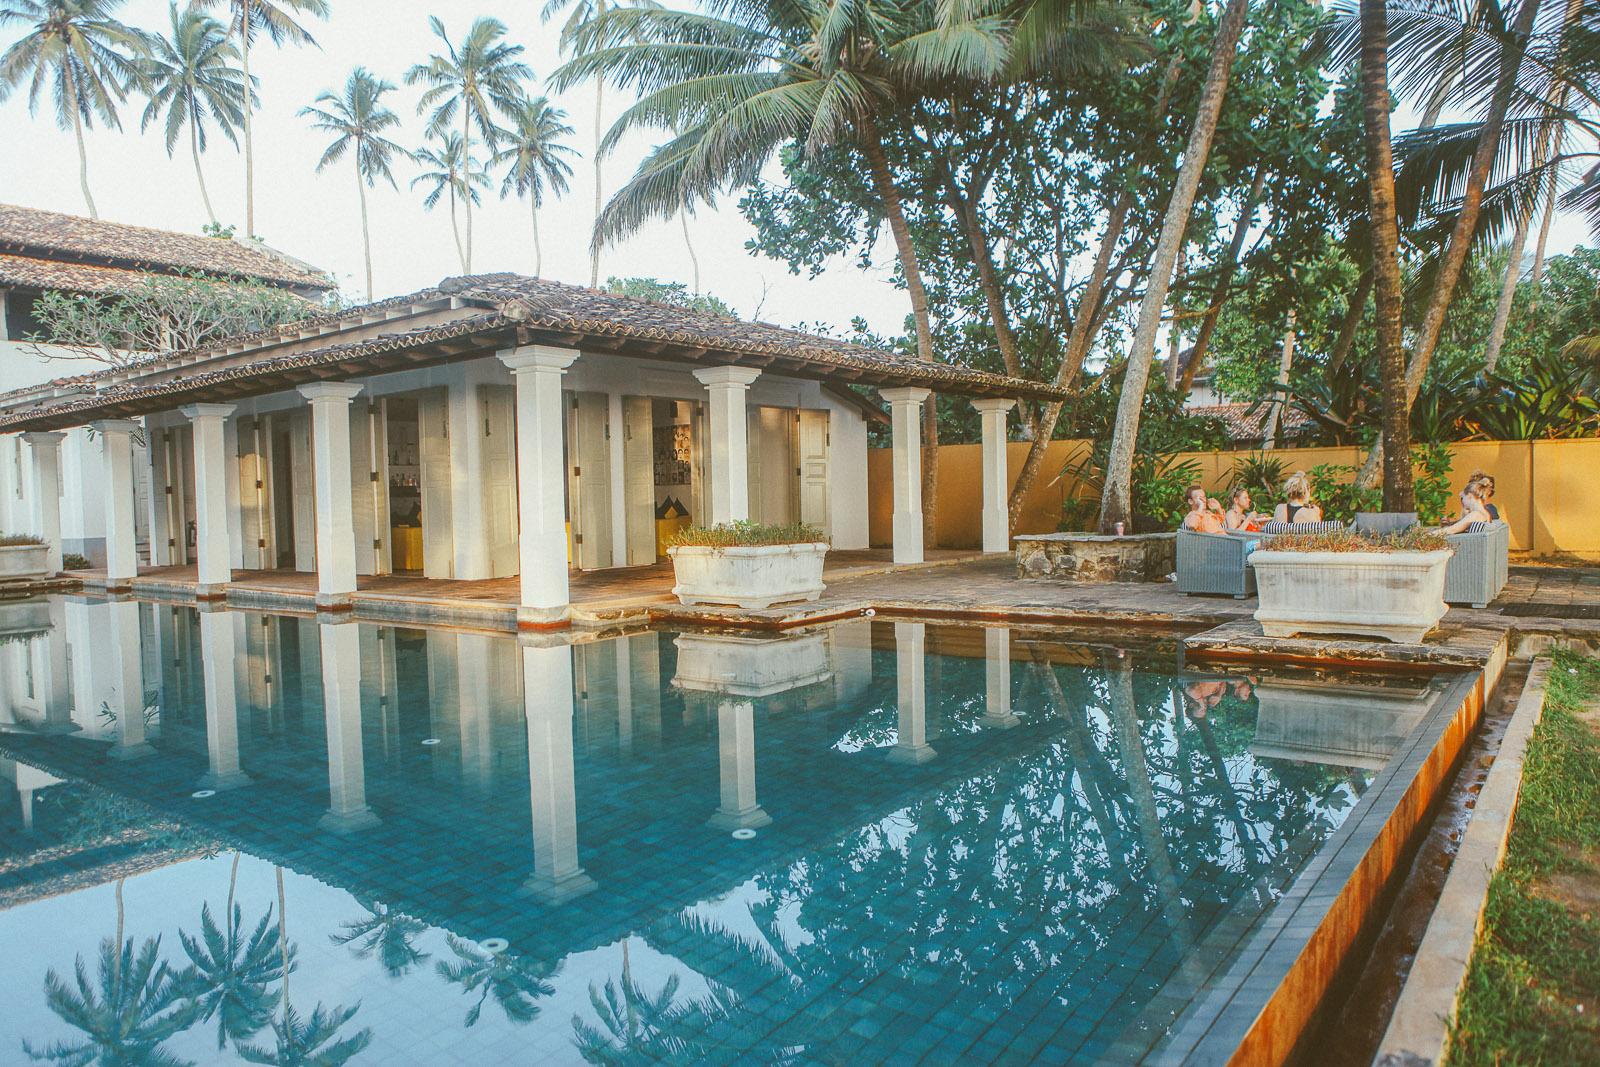 Sri Lanka-Hikkaduwa-Midigama-thalpe-era-beach-jetwing-surf-travel-blog-IMG_8653